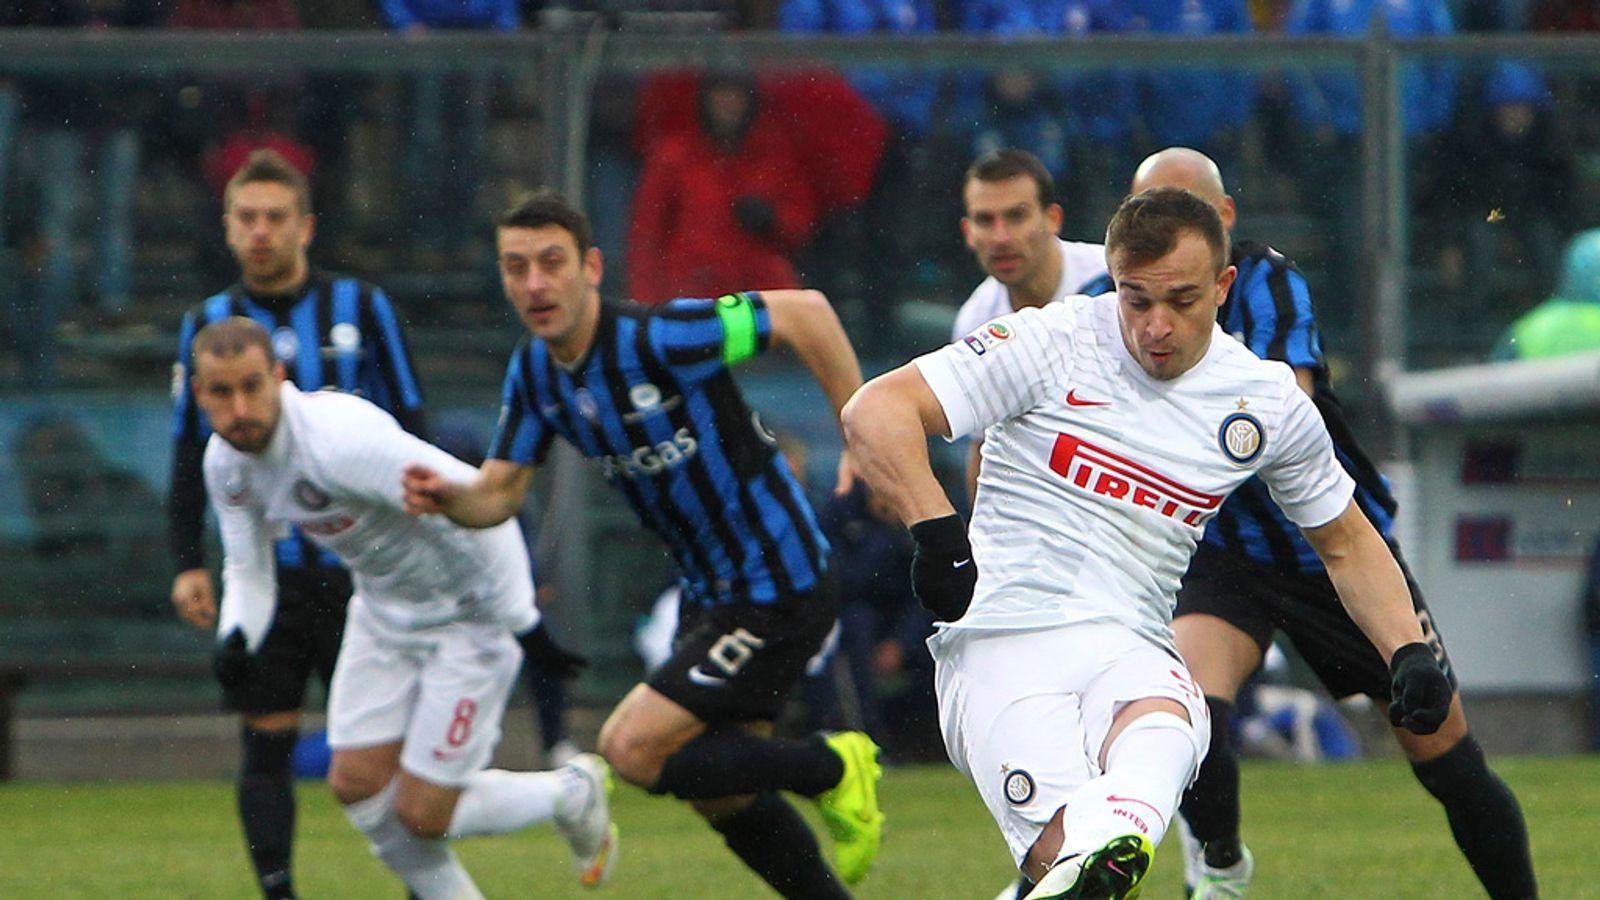 Atalanta 1 - 4 Inter - Match Report & Highlights